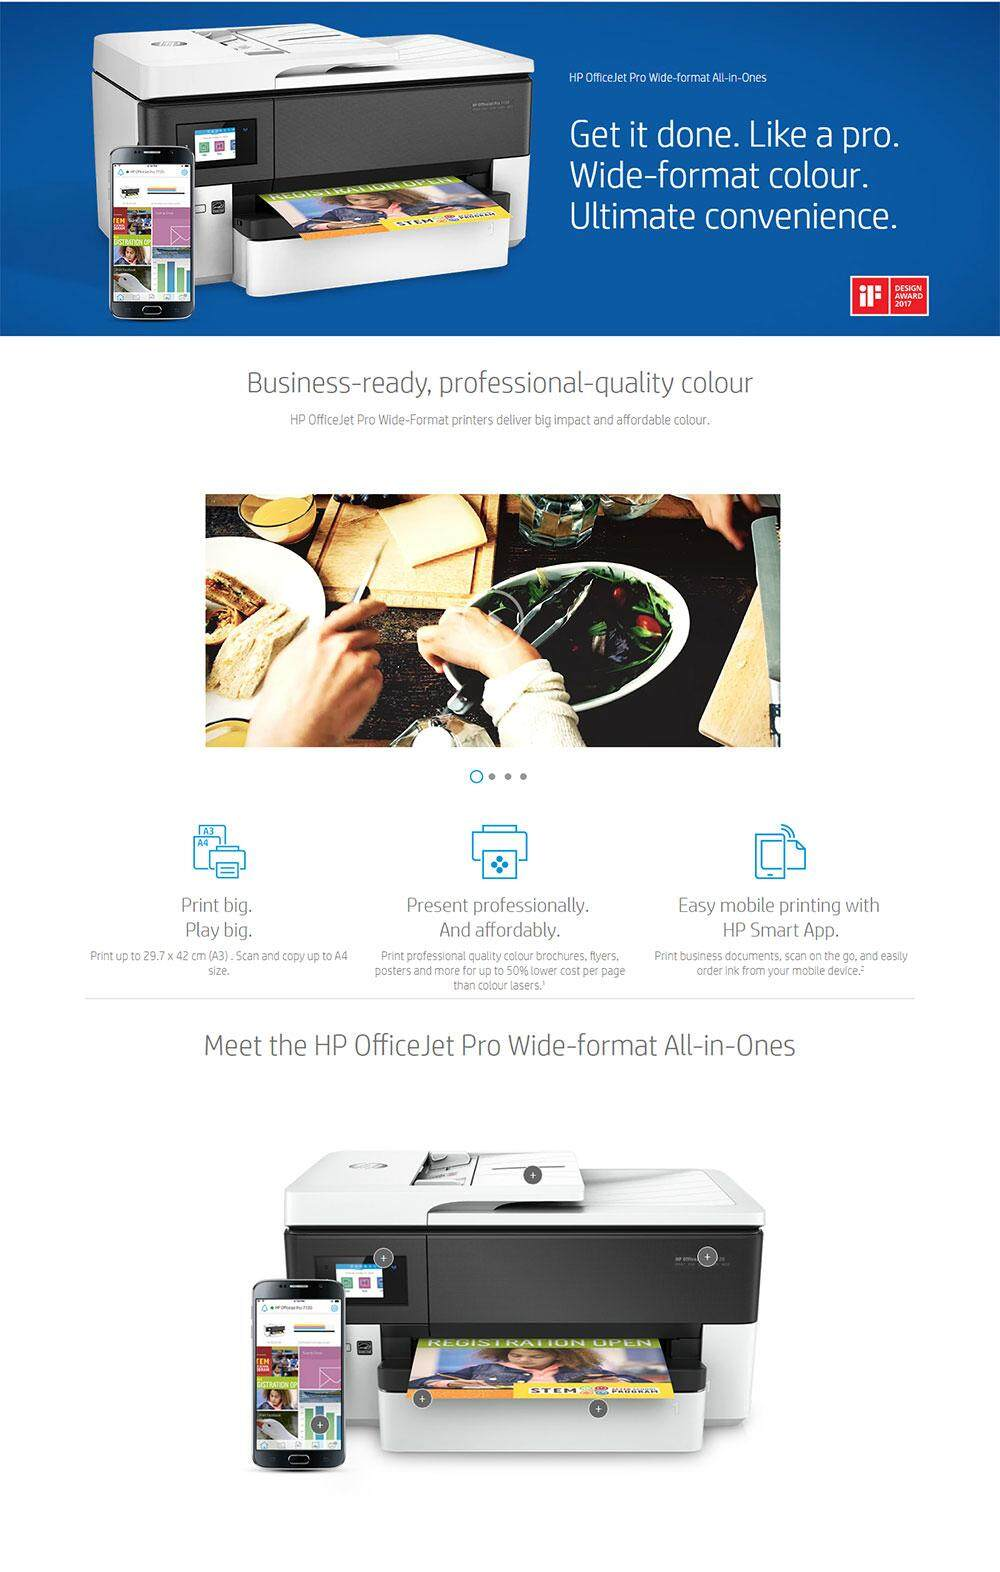 HP Officejet Pro 7730 A3 AIO Printer - Print , Scan , Copy , Fax , Wireless  , Network , 2 tray & Duplex   PrestoMall - Printers